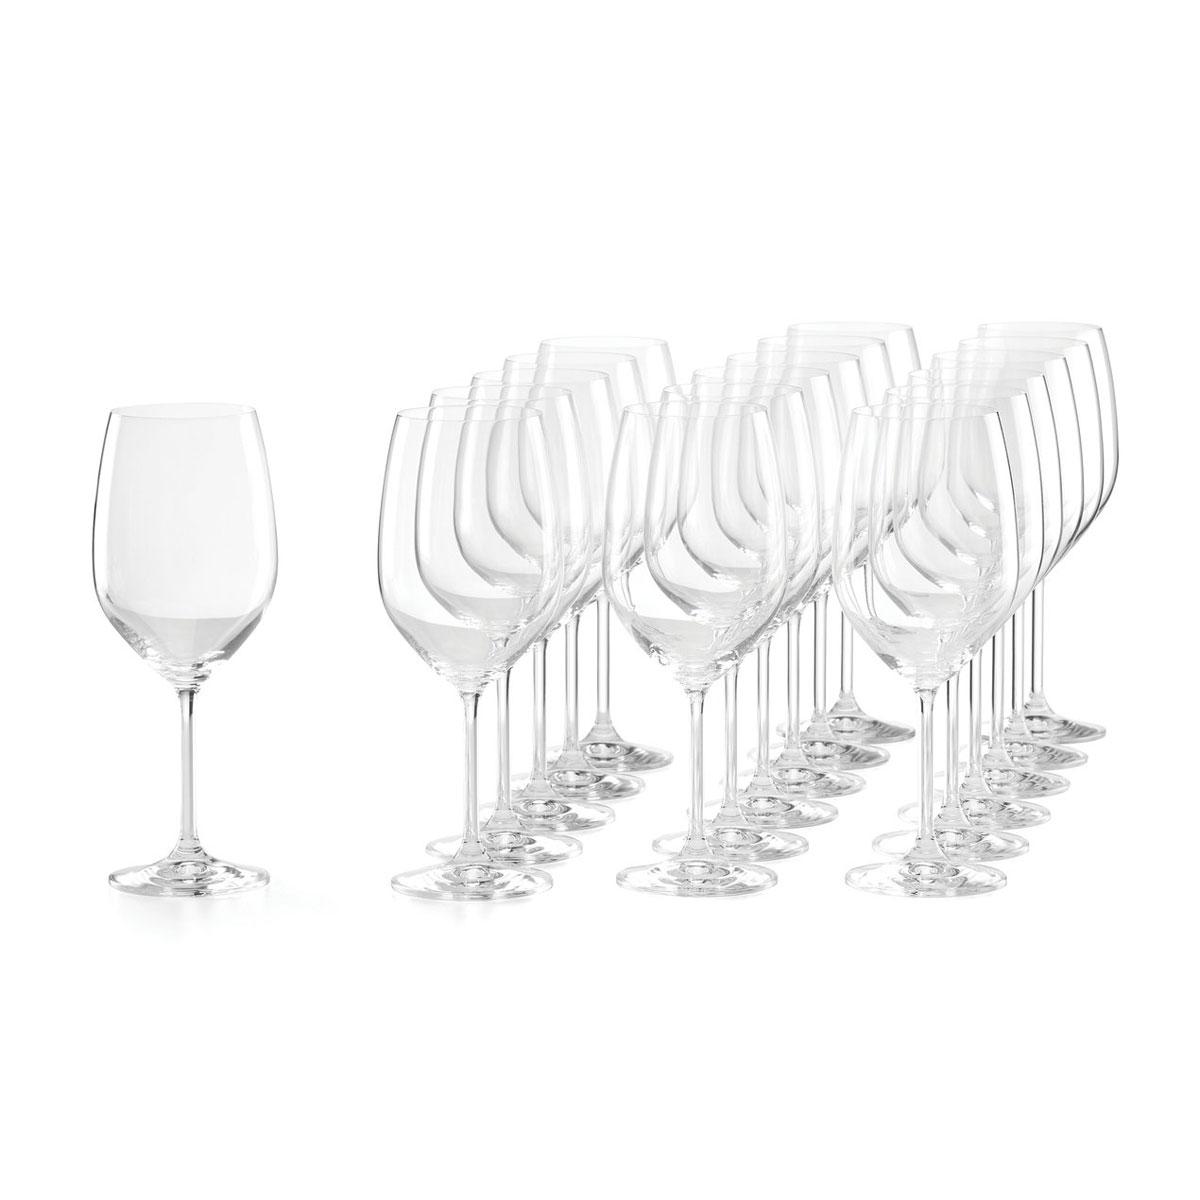 Lenox Tuscany Classics White Wine Glasses, Set Of 18